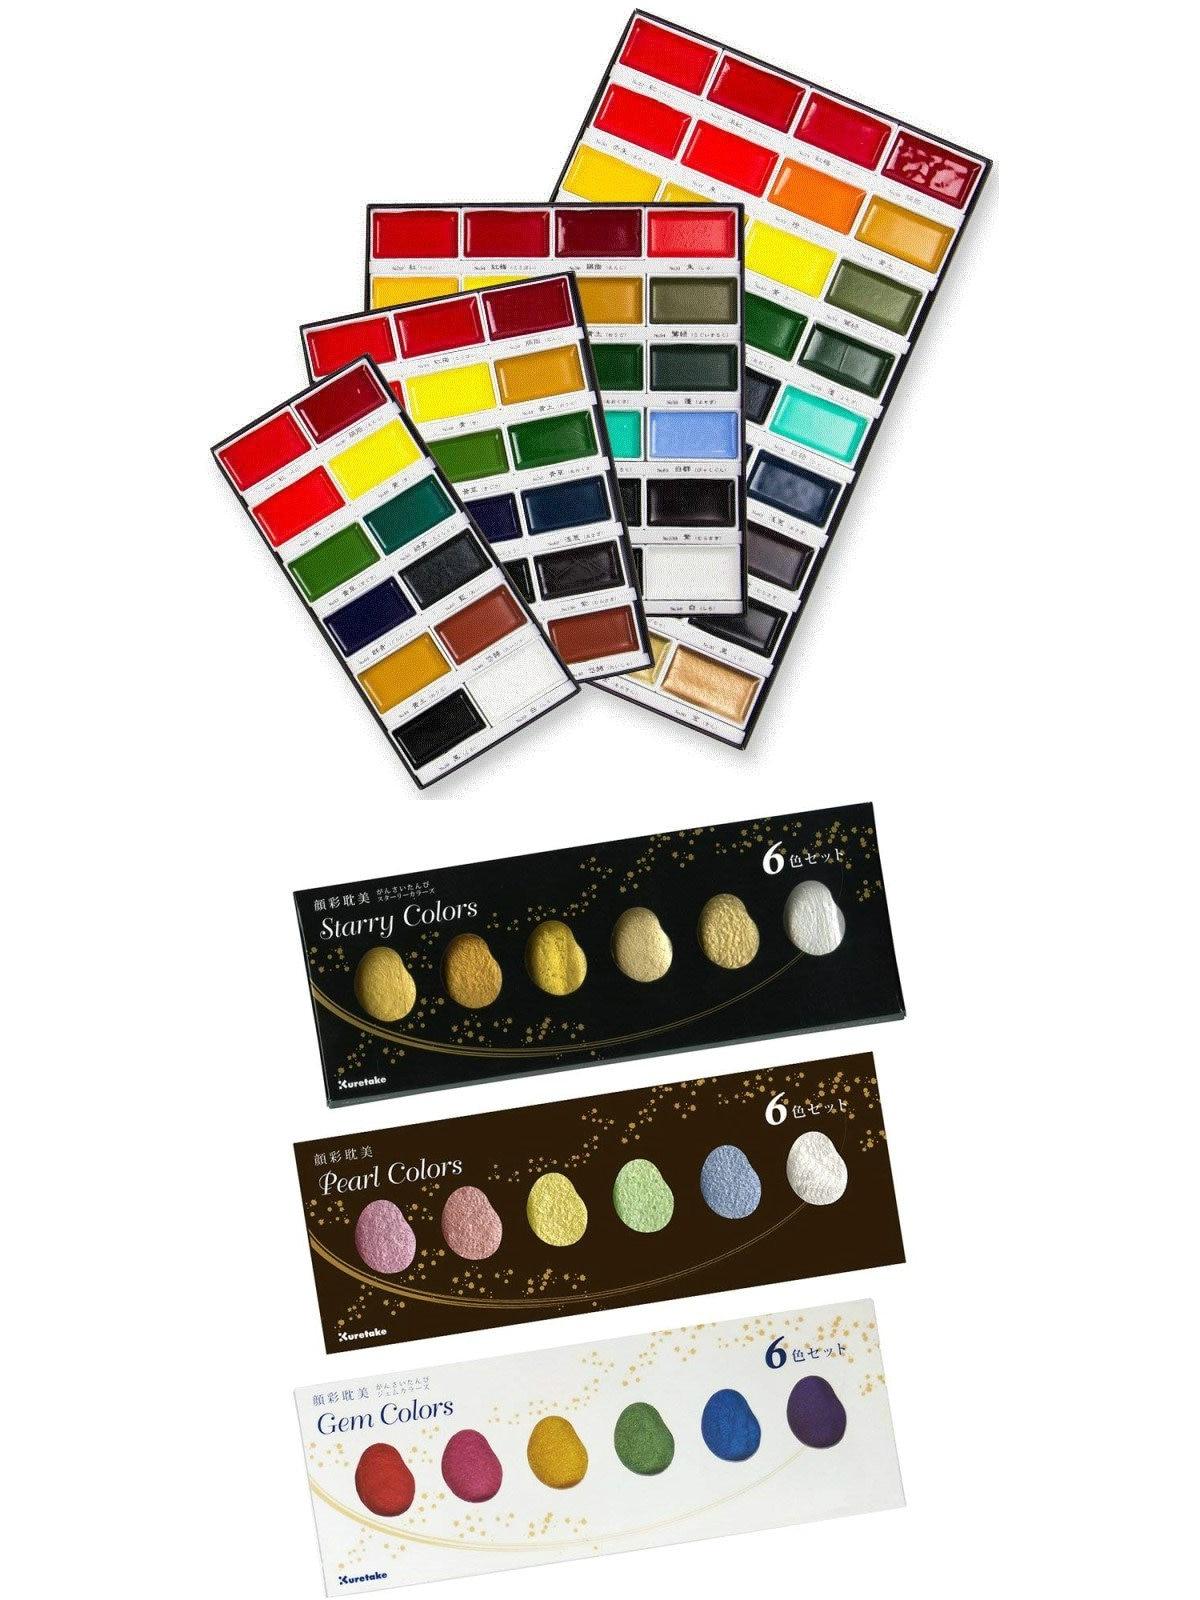 Kuretake Gansai Tambi Watercolor Paint MC20/Starry Pearl Gem 12V 18V 24V 36V 48V Colors Art Supplies